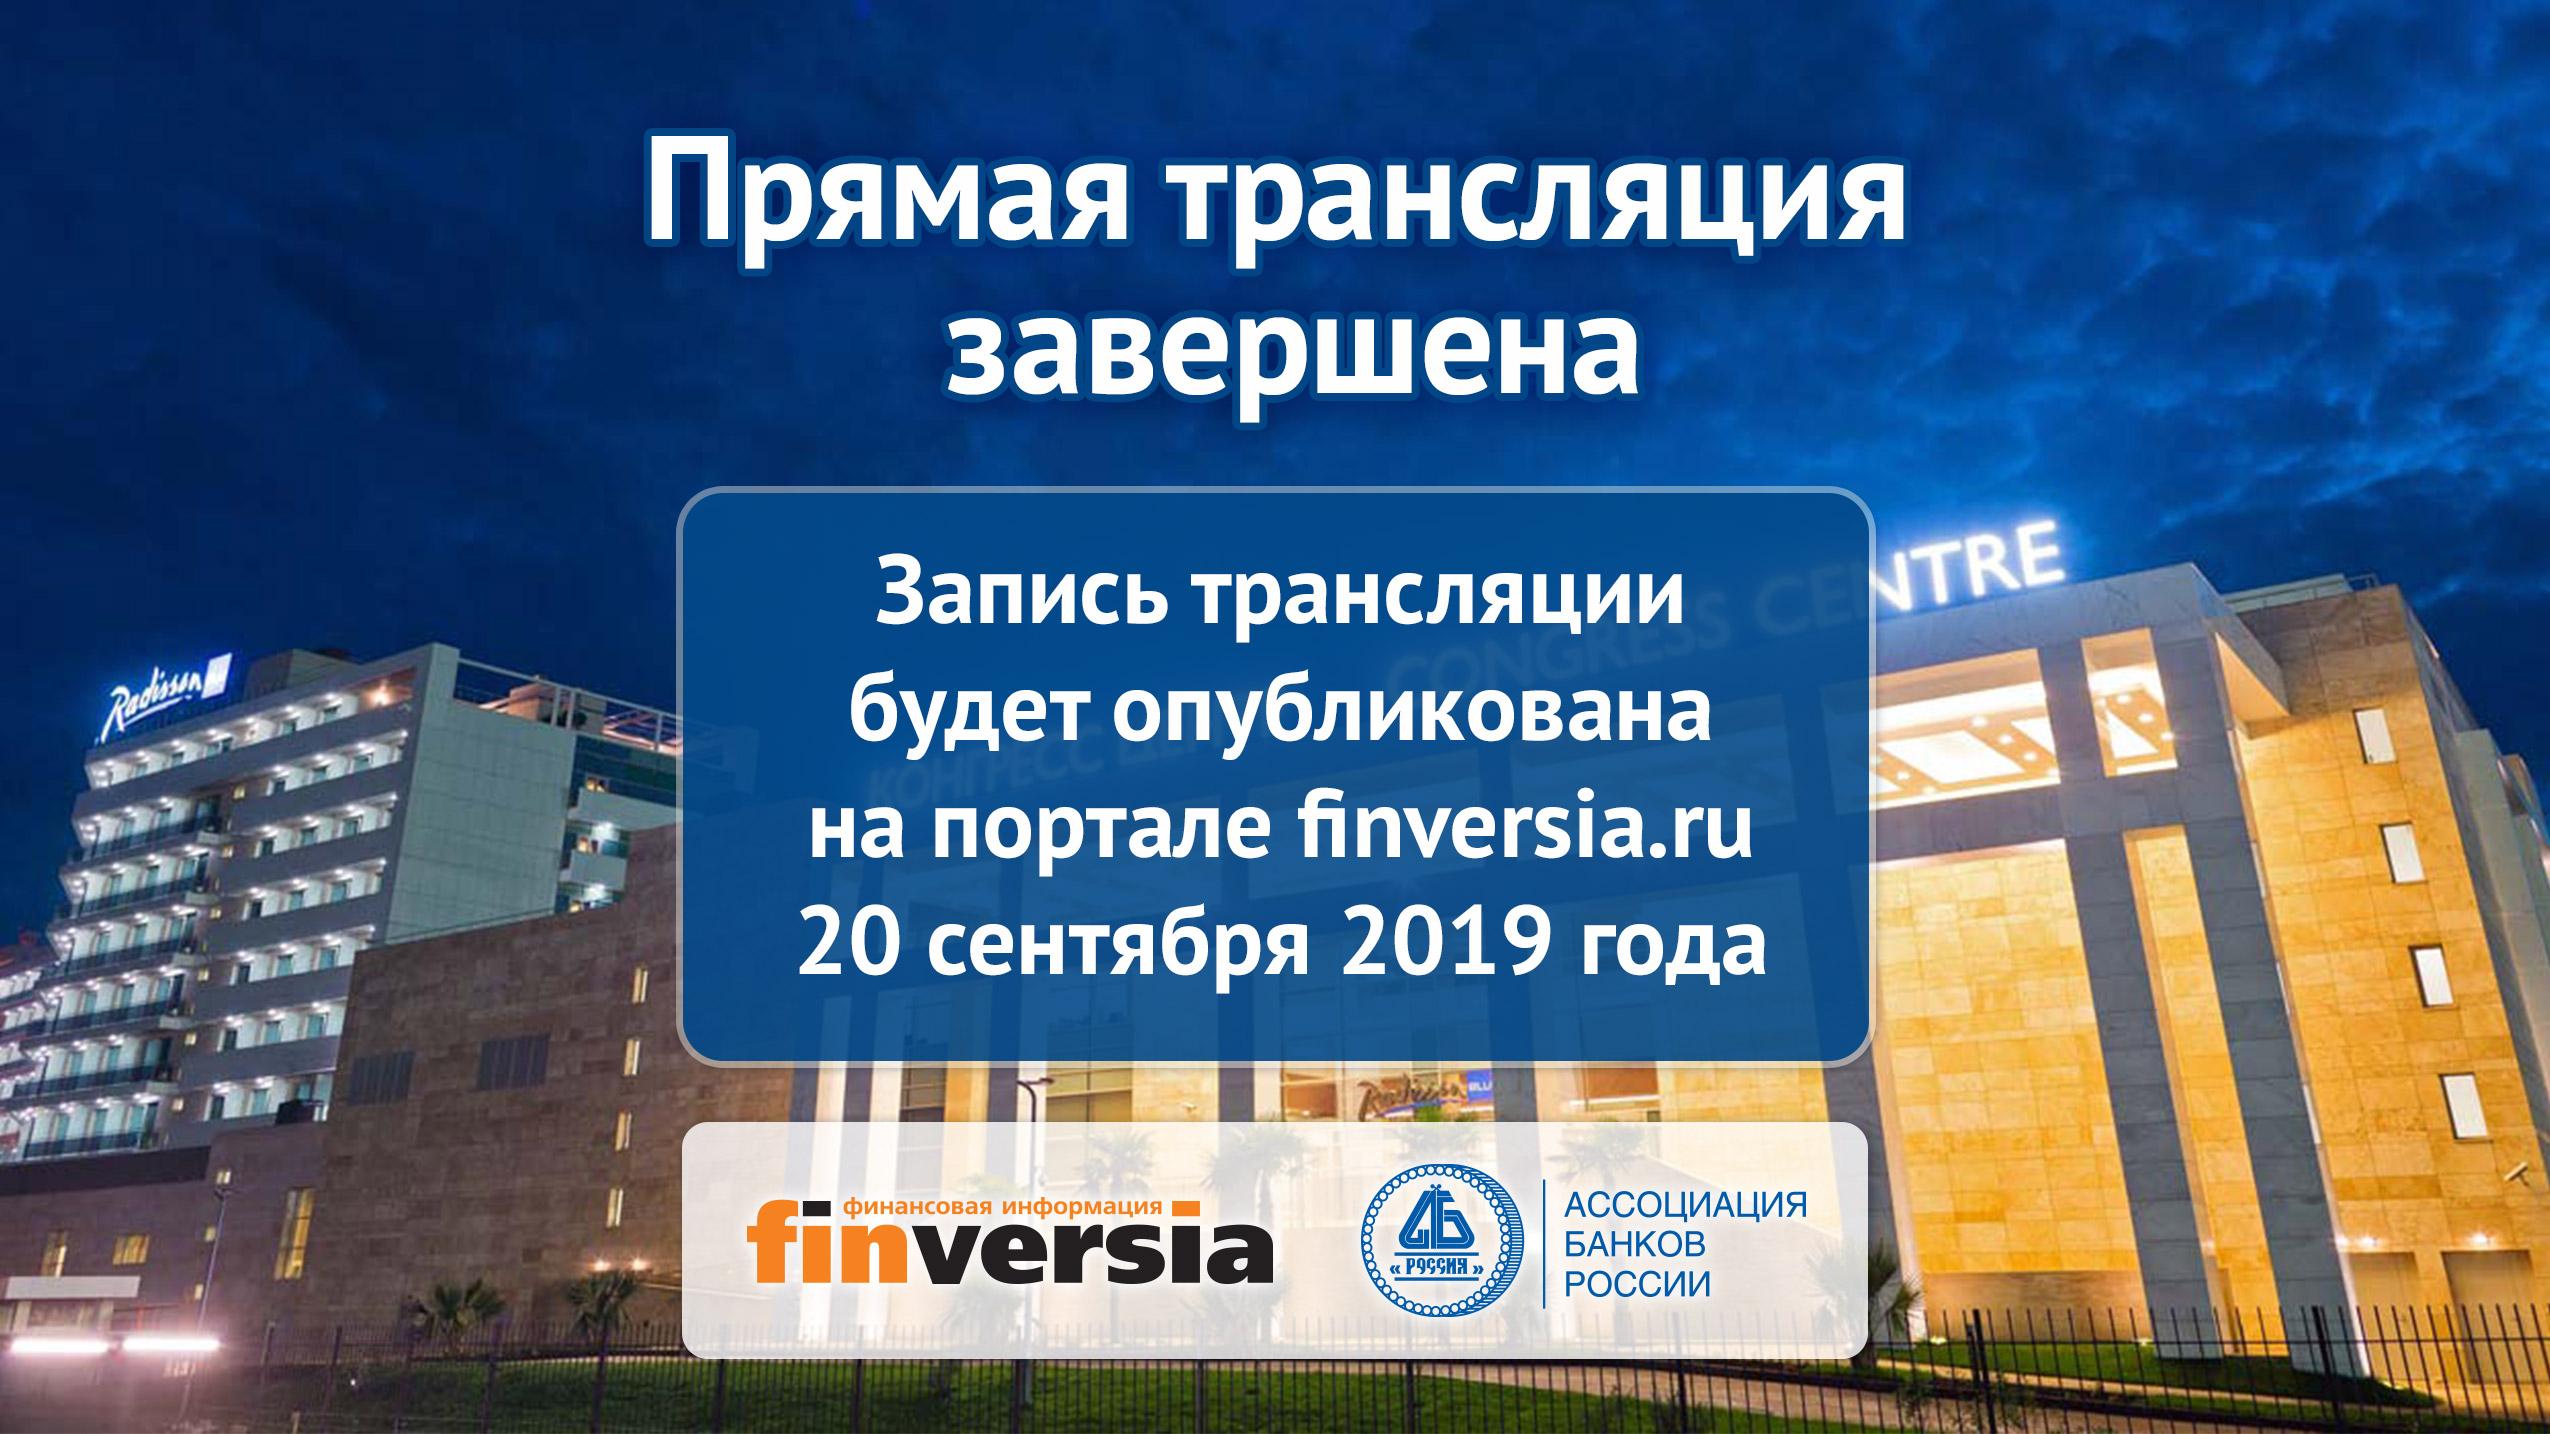 Трансляция международного банковского форума в Сочи на Finversia-TV